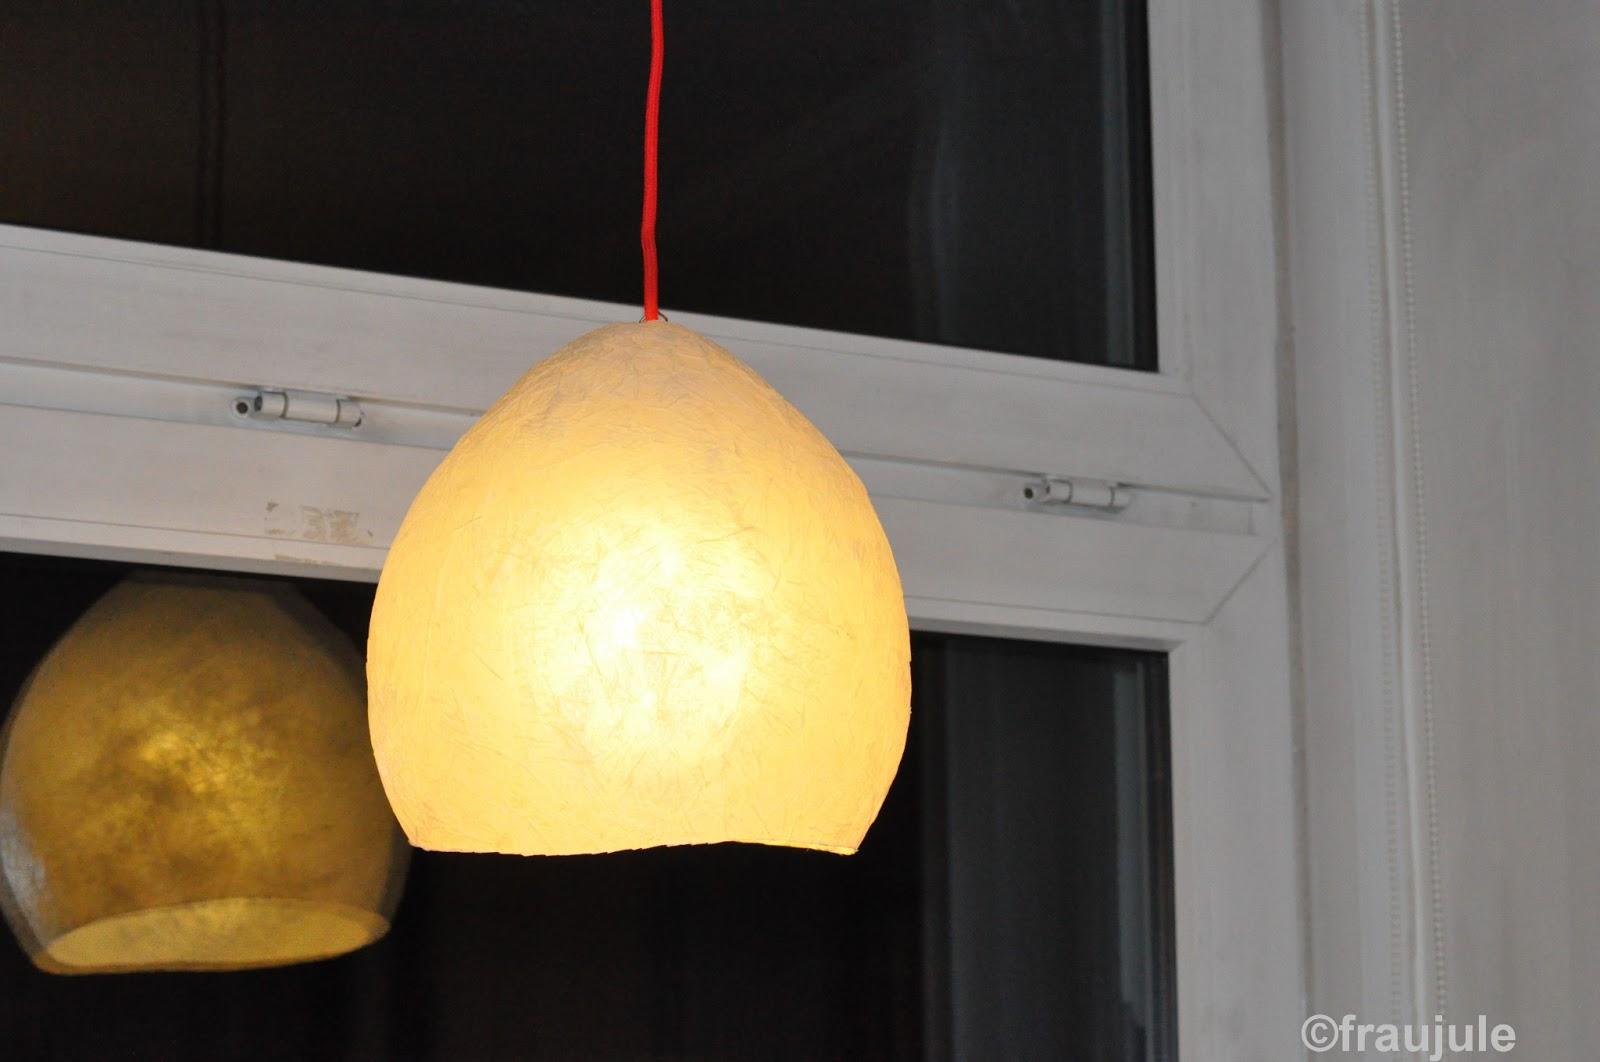 schweden lampen finest licht holz antiquitt fenster gebude alt zuhause mauer laterne blau lampe. Black Bedroom Furniture Sets. Home Design Ideas